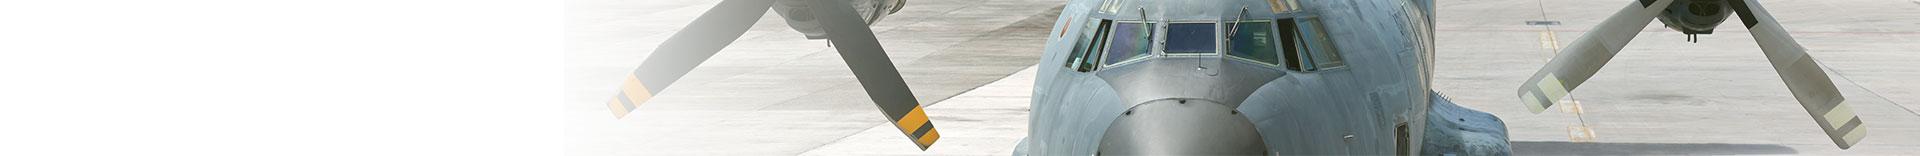 fields: avionics | APLUS SA | Defense & Security